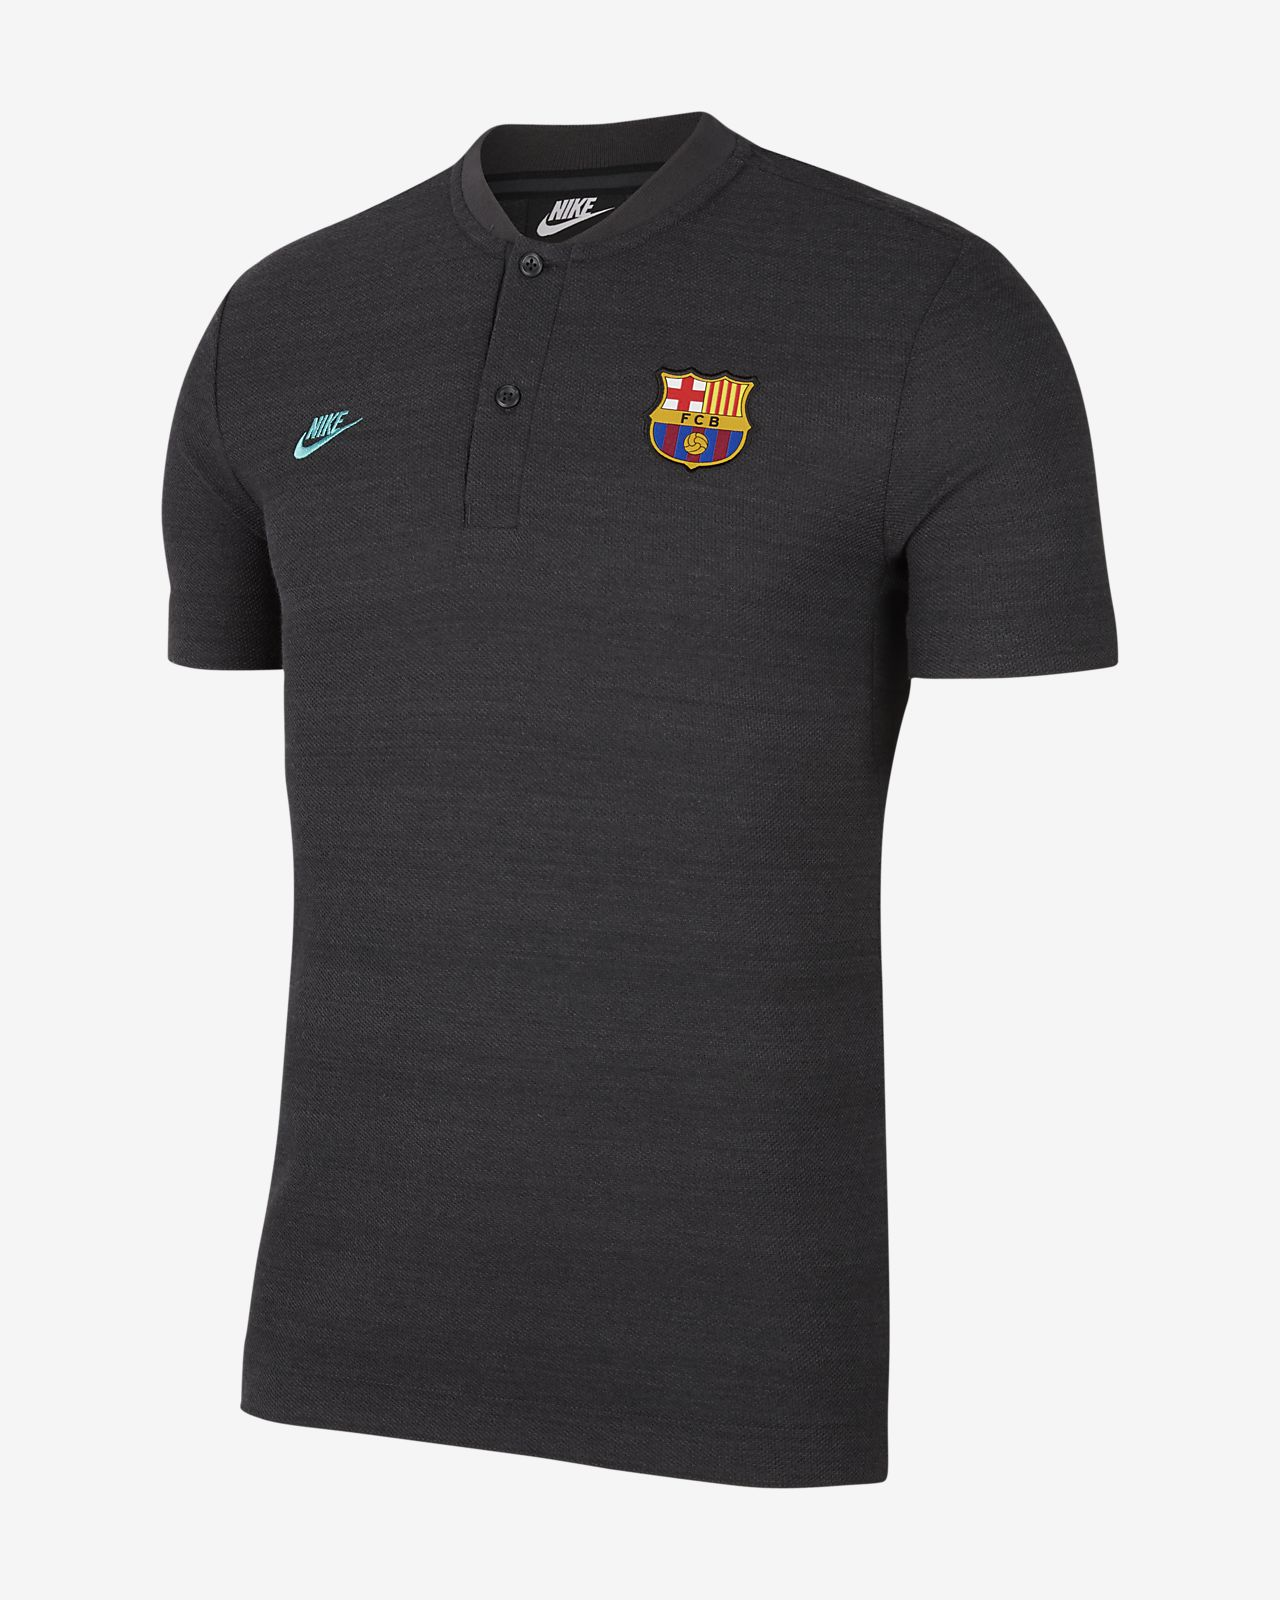 Luminancia Araña judío  FC Barcelona Men's Polo. Nike RO